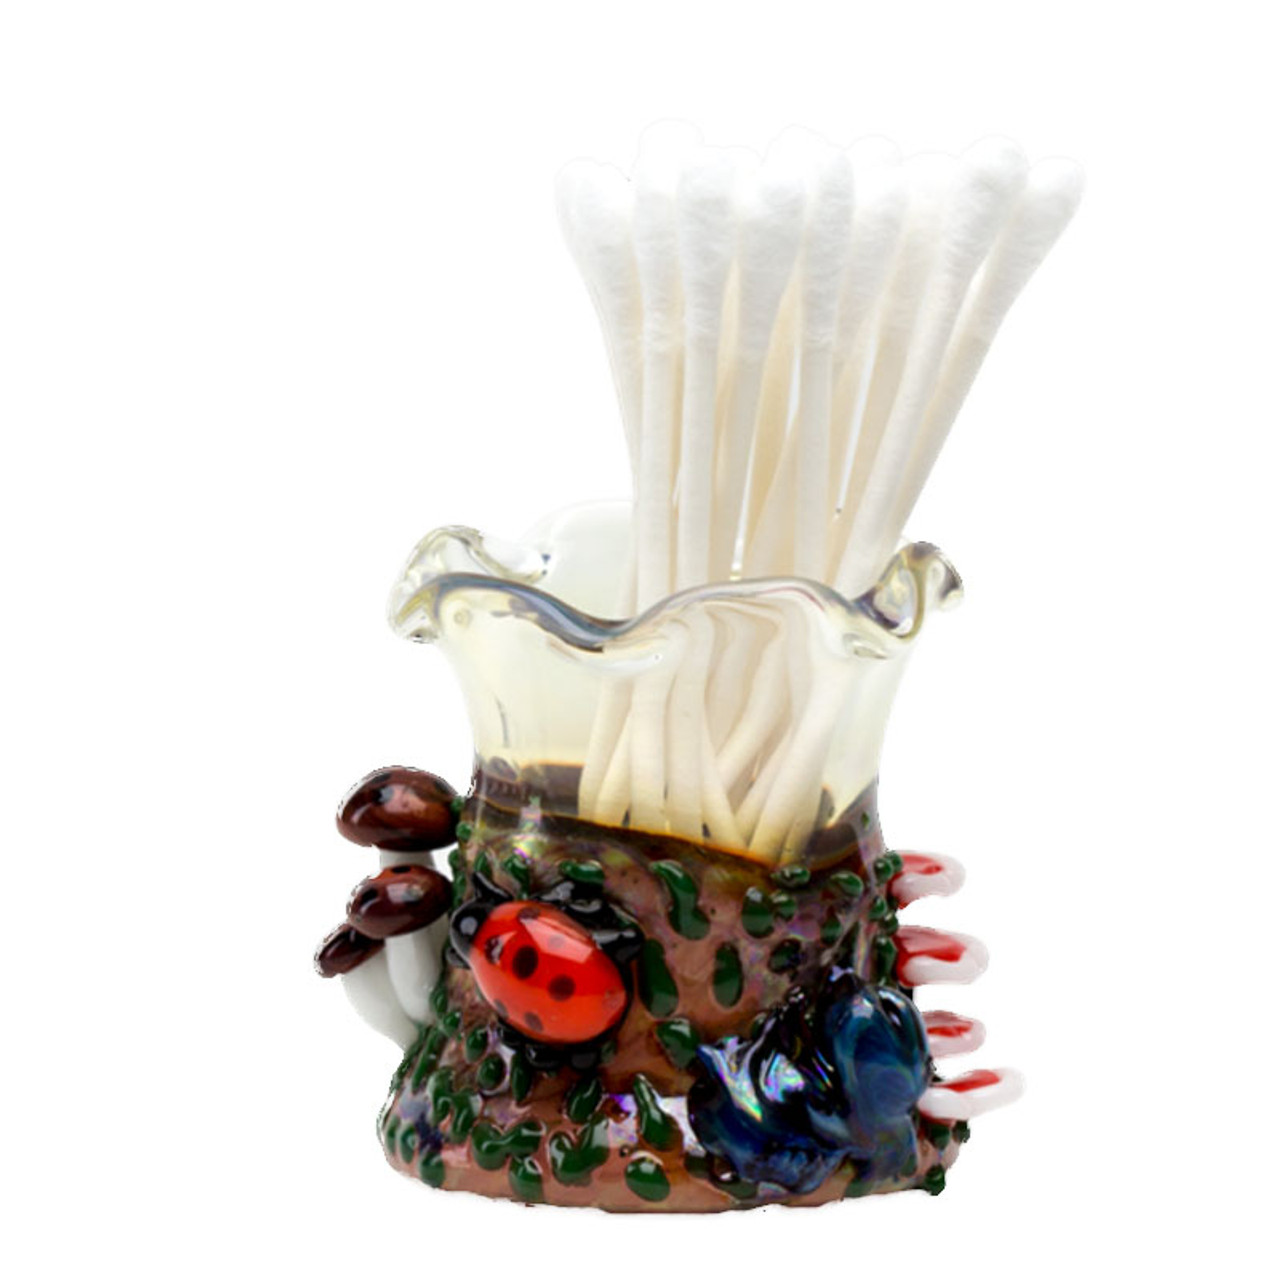 Empire Glassworks - Q-Tip Holder - Bug's Life